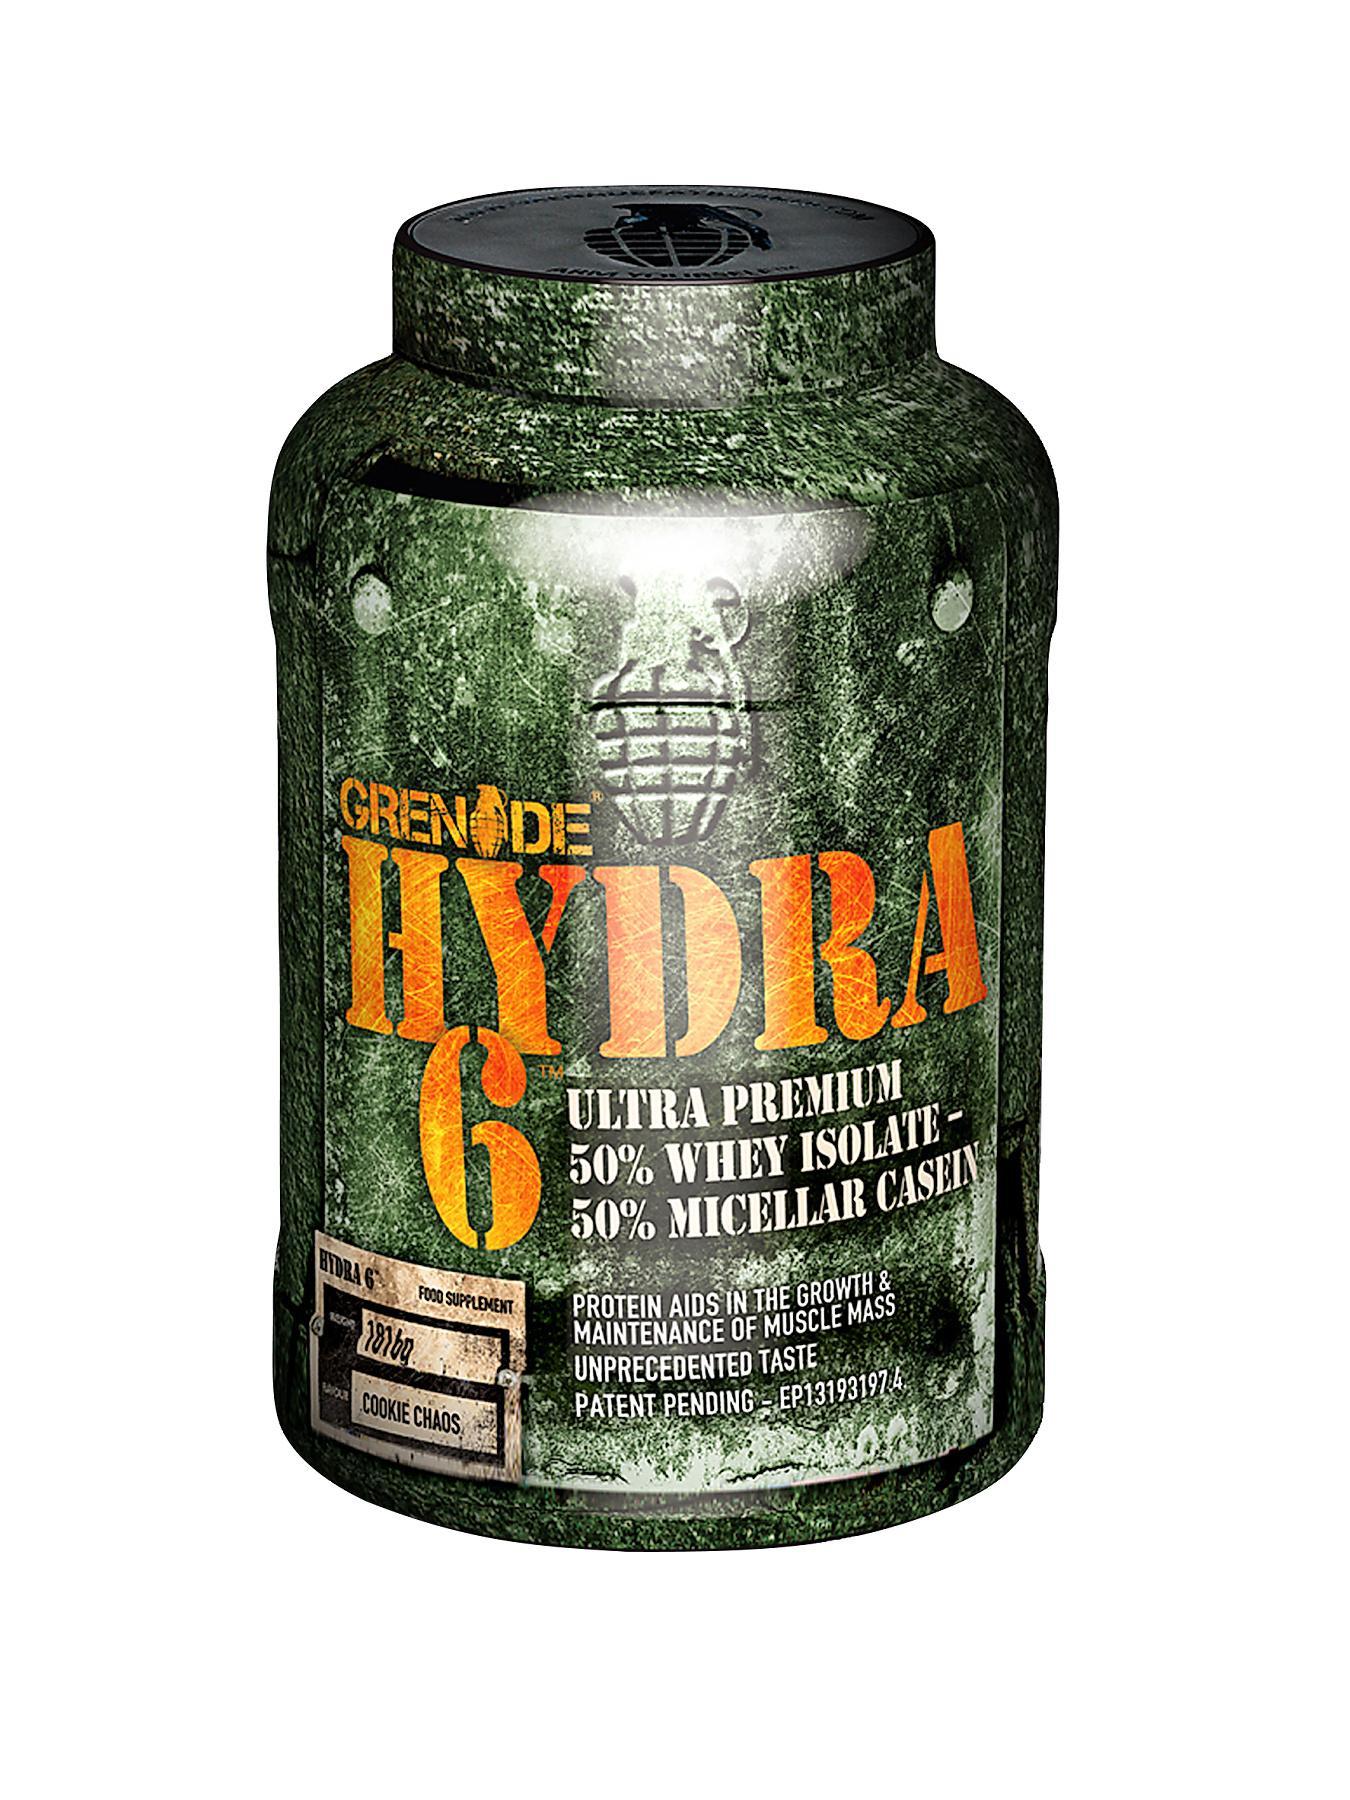 GRENADE Hydra Protein Powder 1.8kg Cookie Chaos